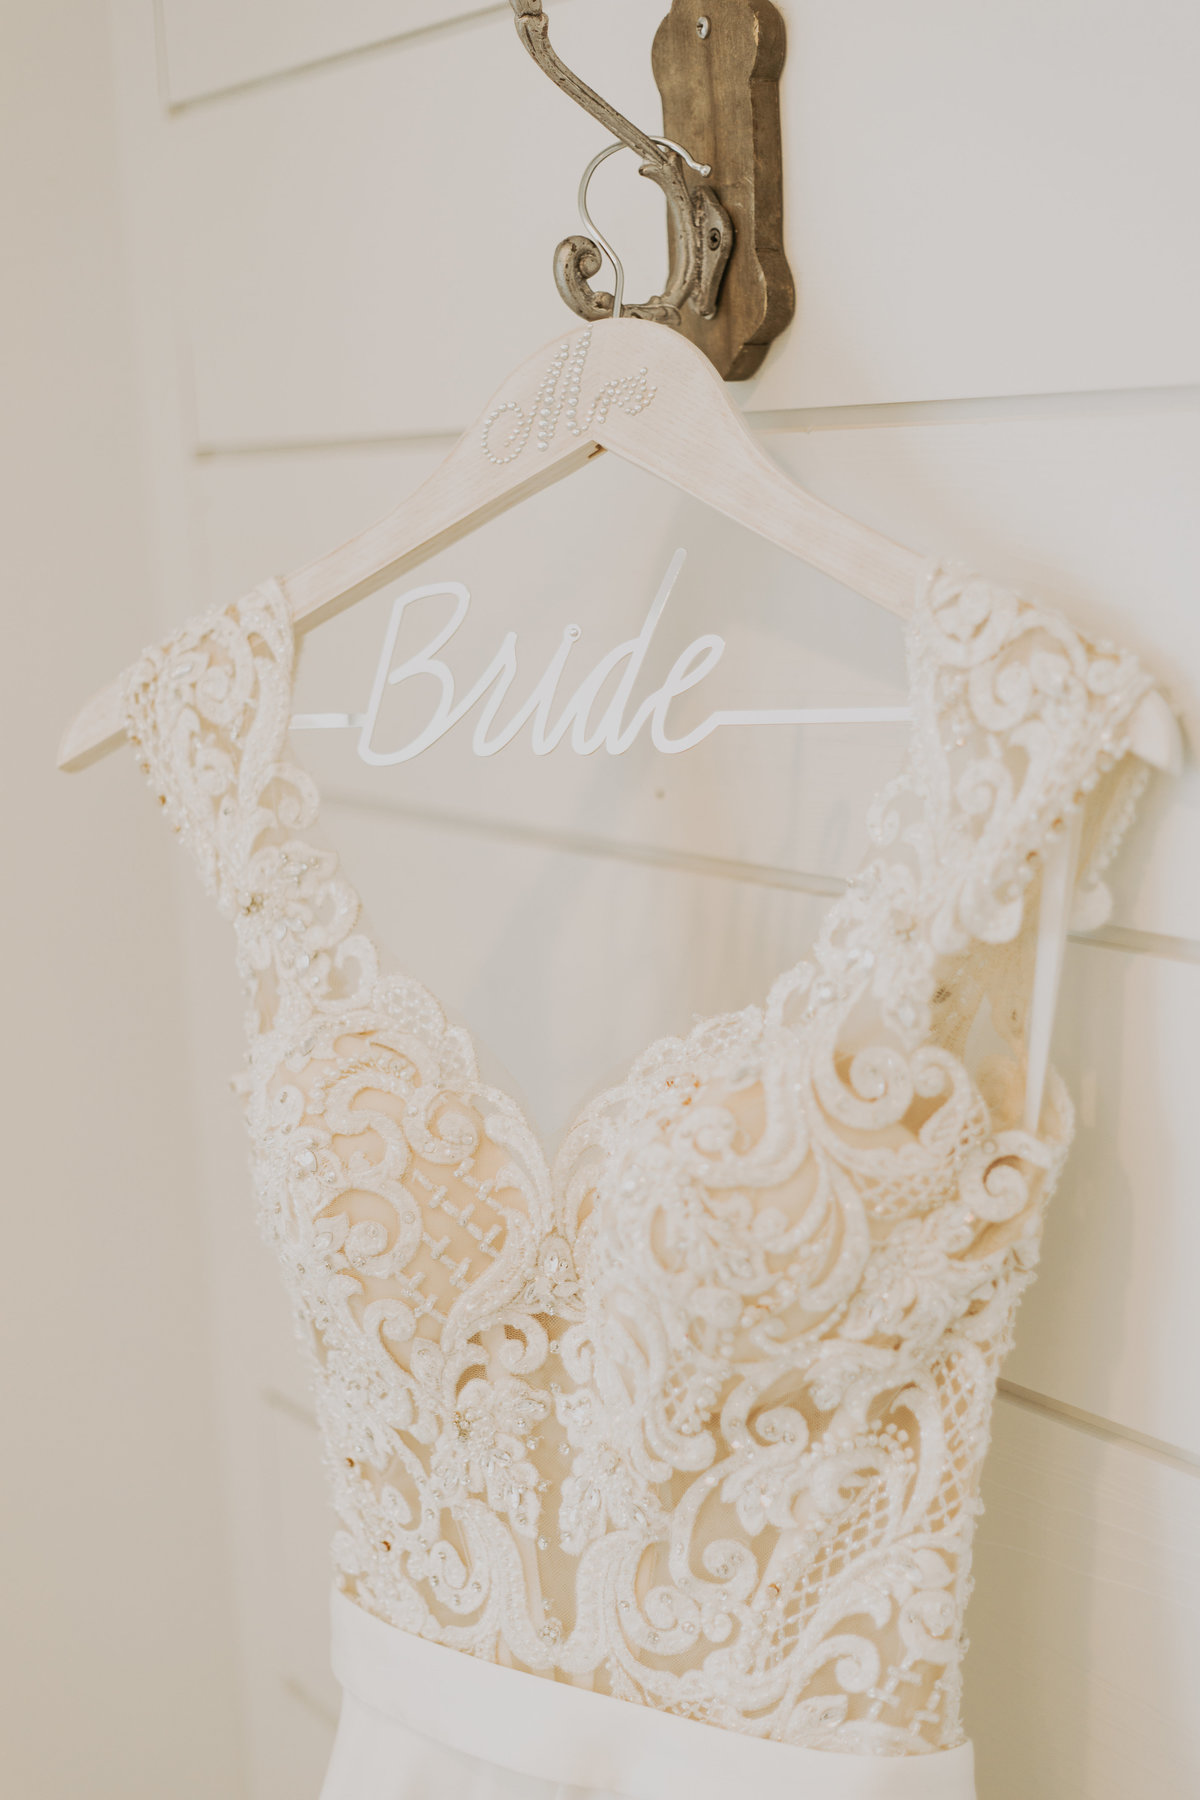 Rosie Creek Farms~ Barn Wedding & Reception Venue - Panama ...